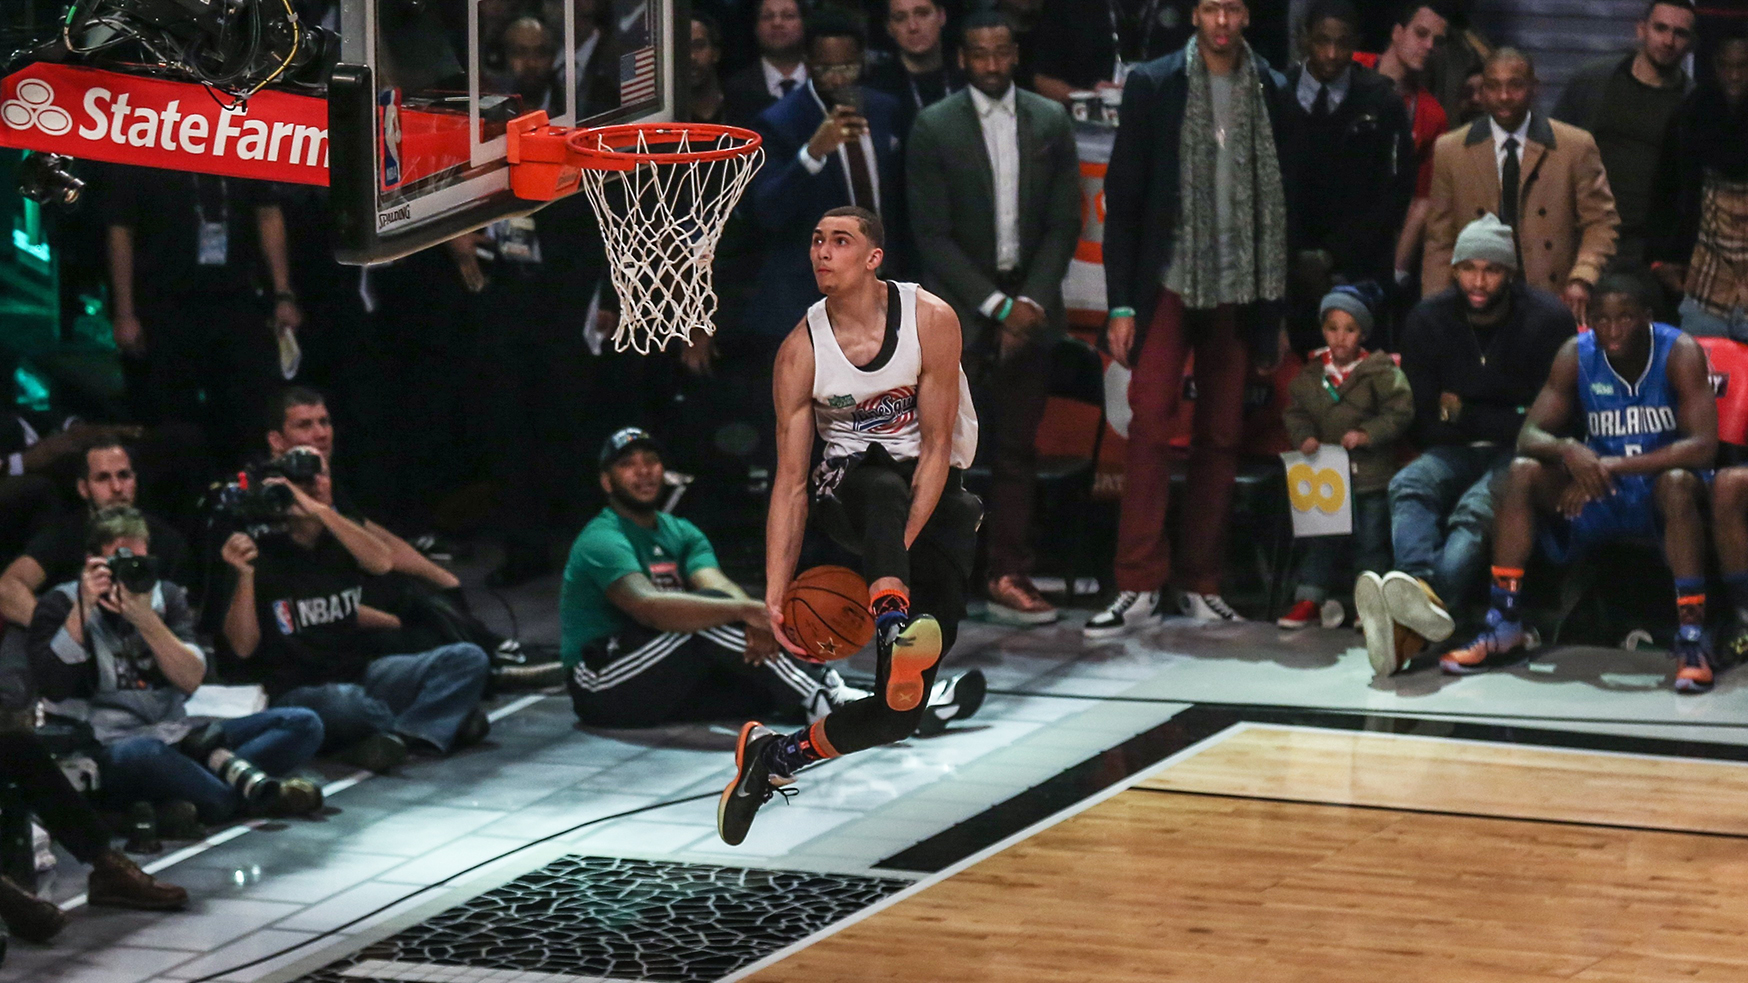 NBA All Star Weekend 2015